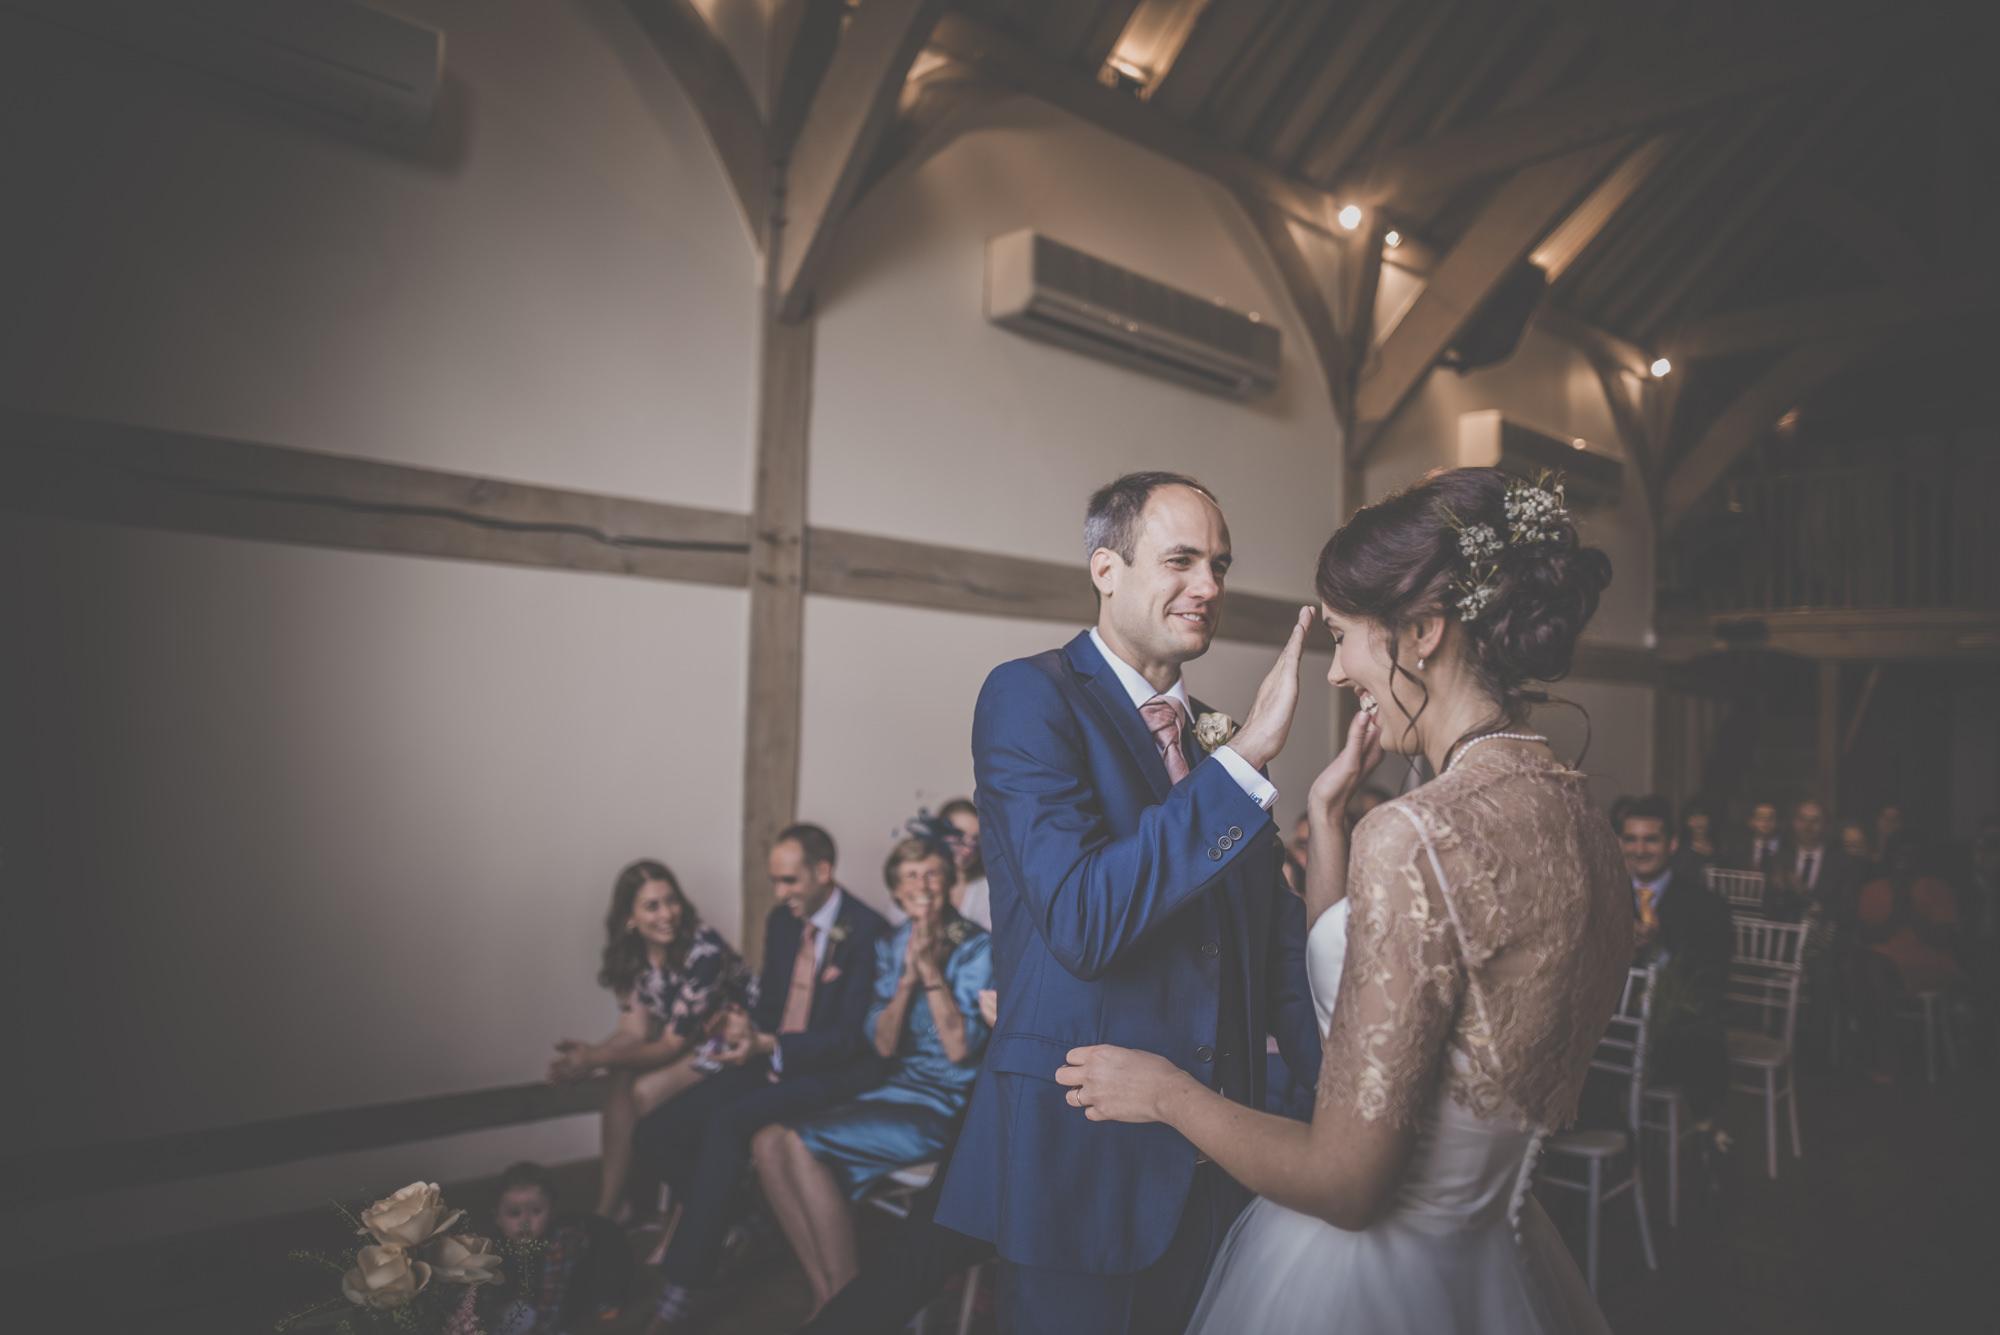 Charisse-and-James-wedding-in-Cain-Manor-Venue-Hampshire-Manu-Mendoza-Wedding-Photography-281.jpg